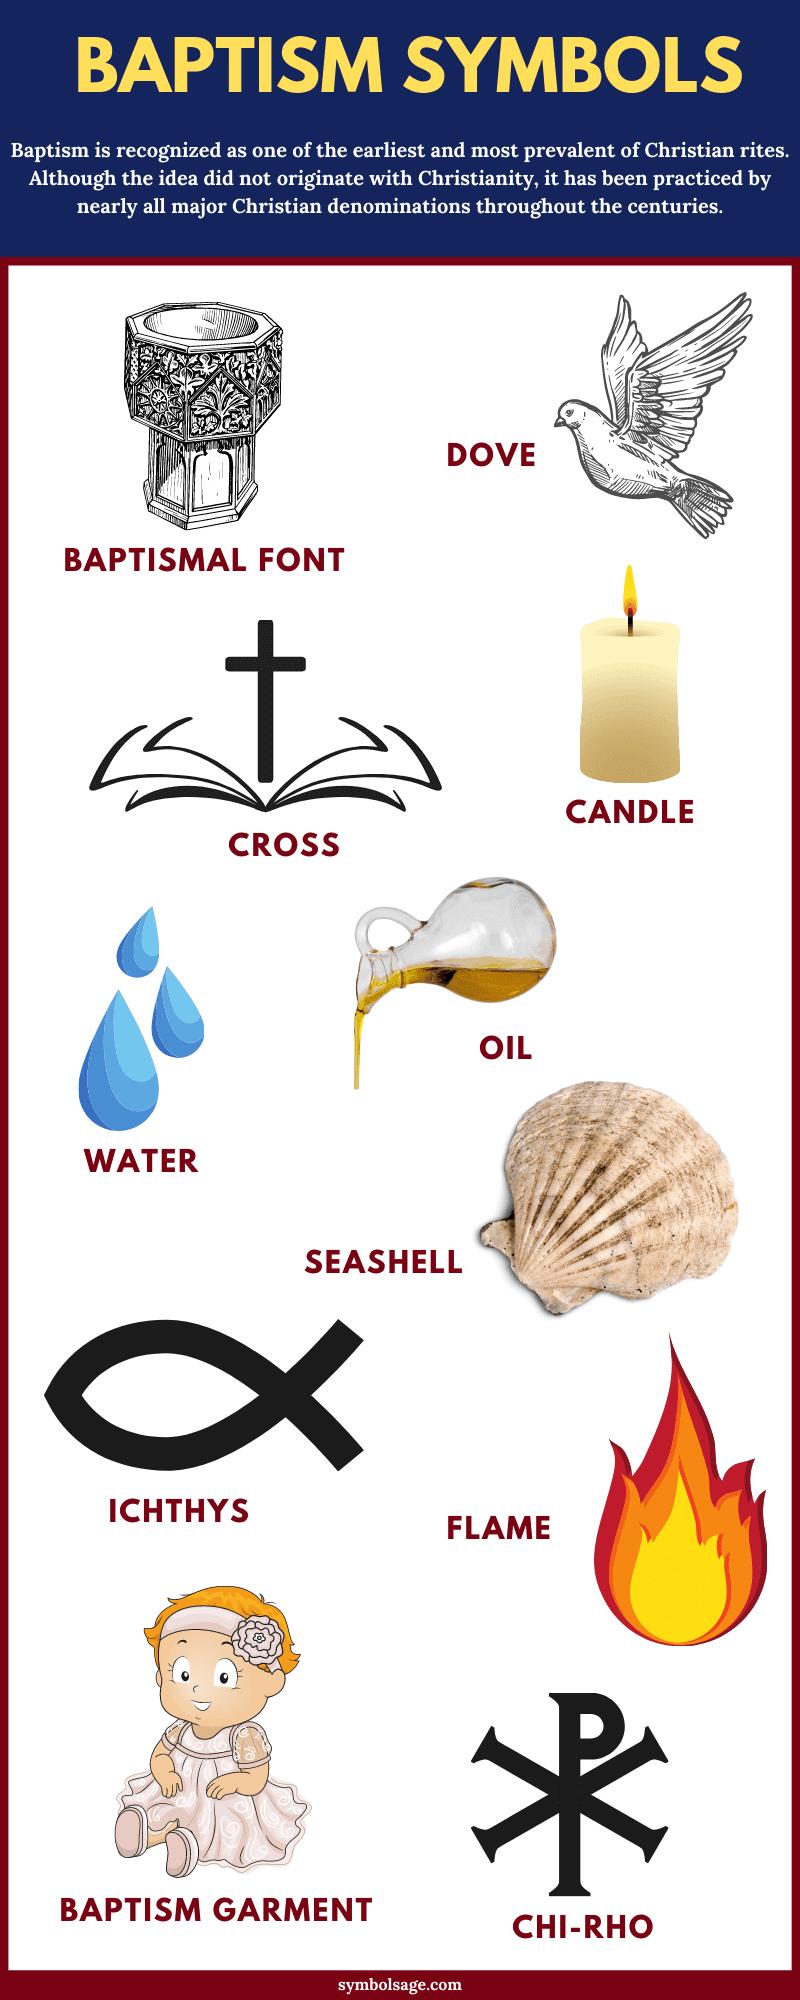 Baptism symbols list